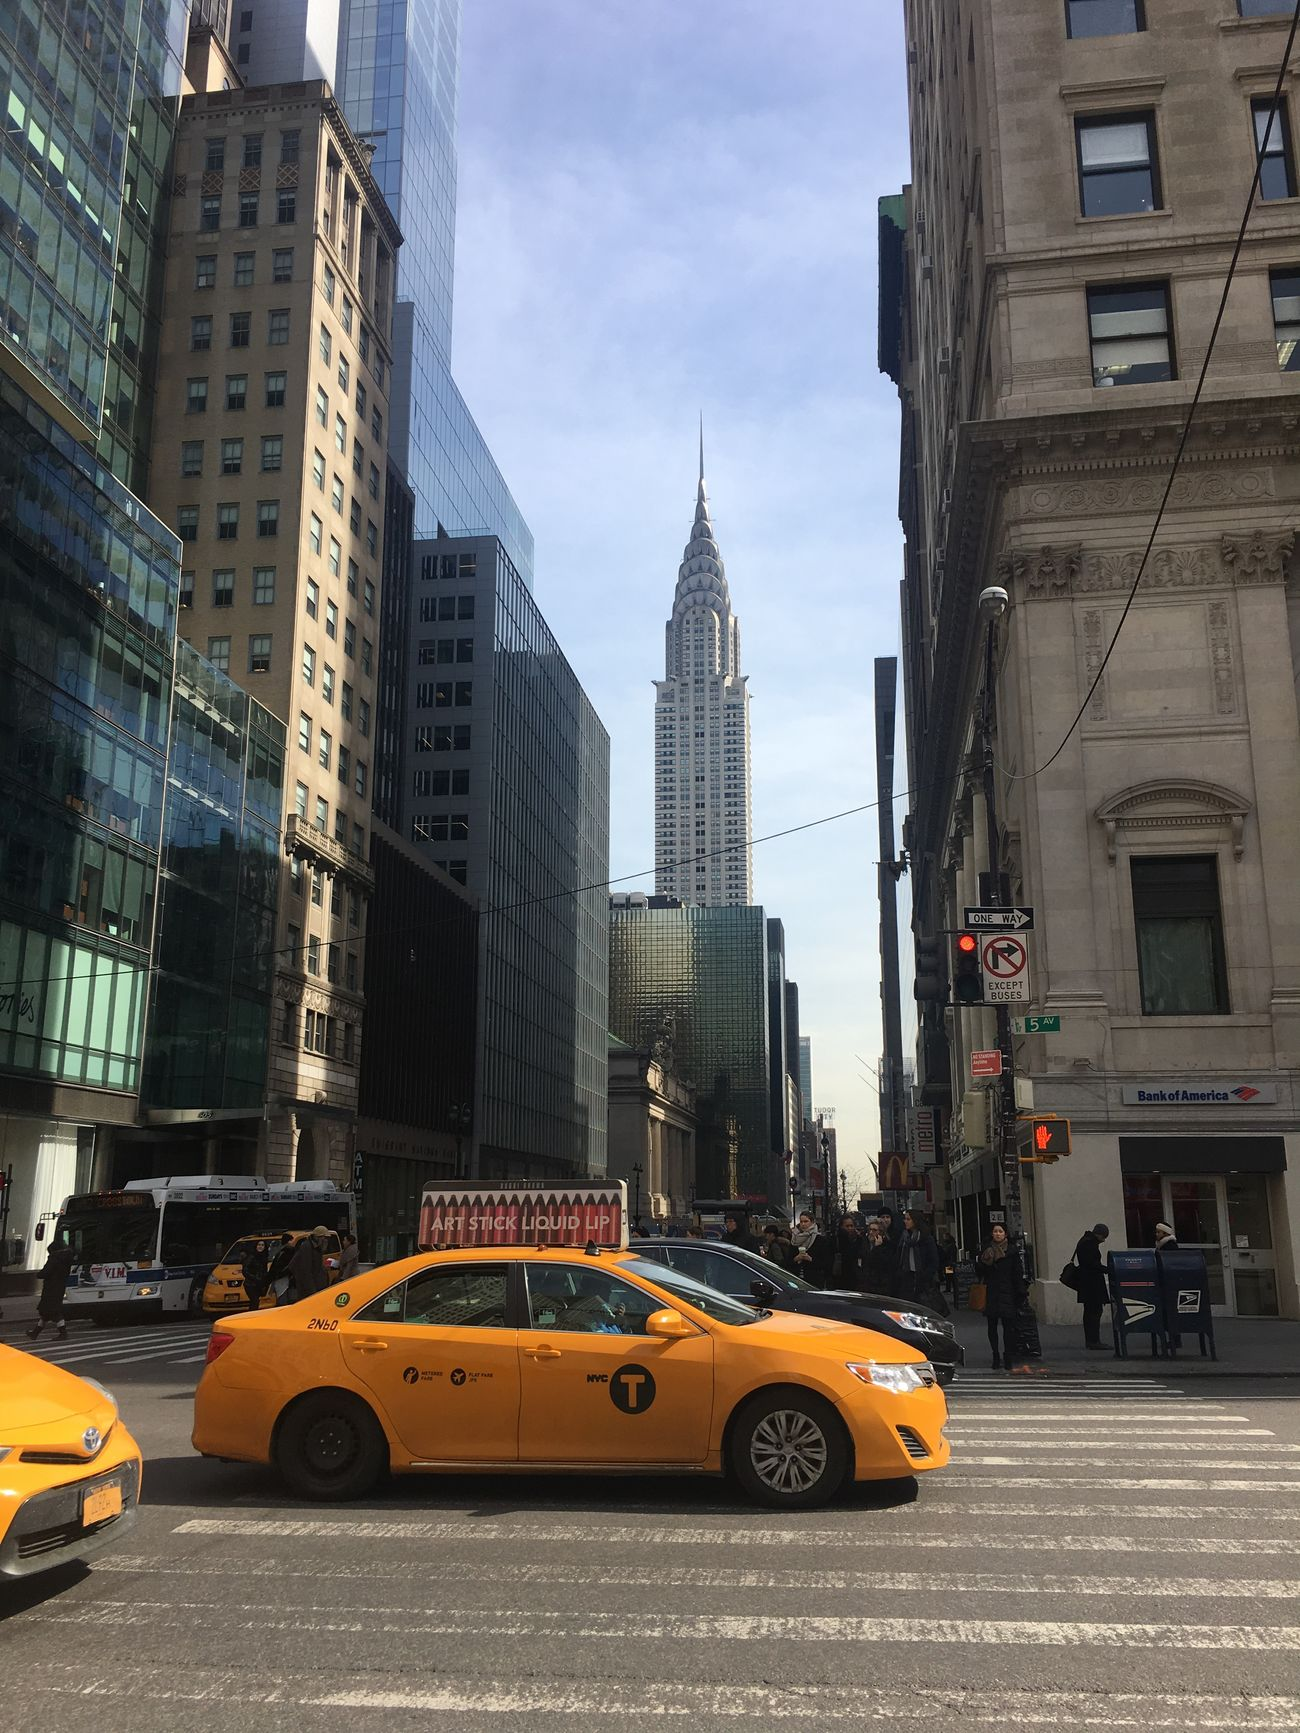 New York City Cab 46624